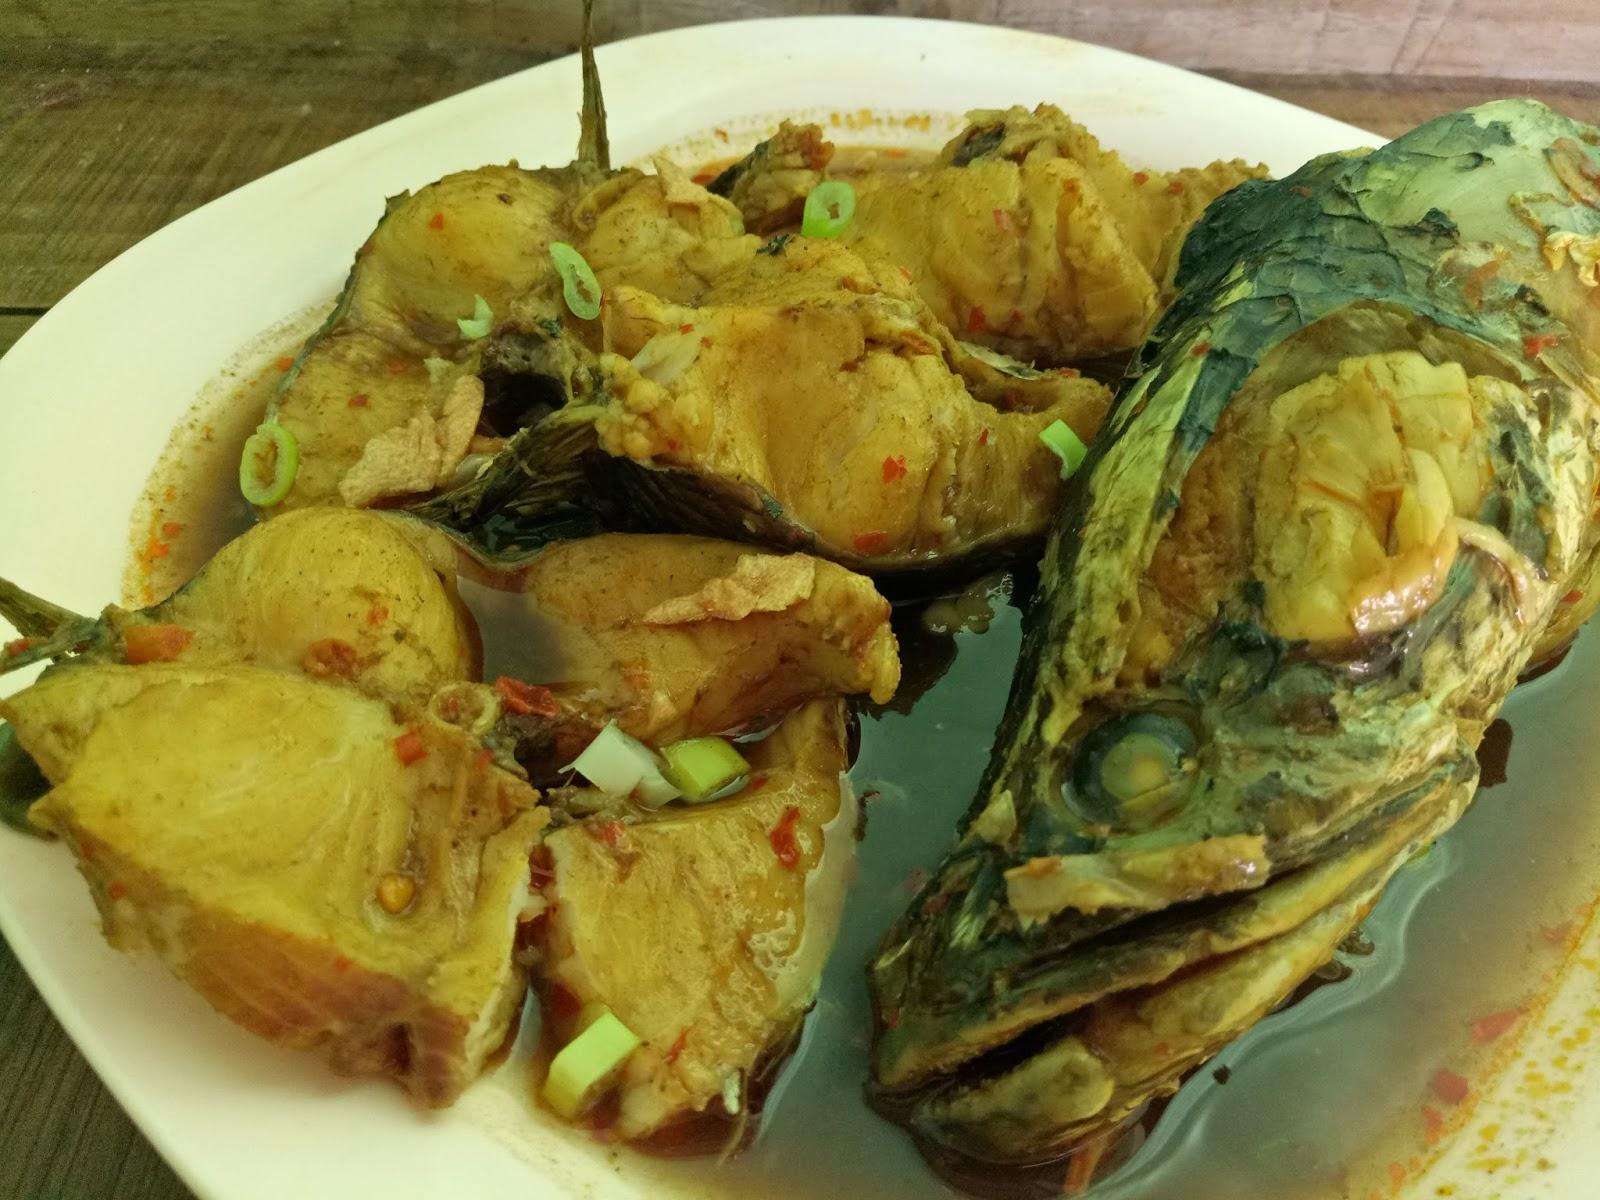 Resep Dan Cara Membuat Masakan Ikan Gabus Kuah Kuning Yang Enak Nikmat Dan Sederhana Selerasa Com